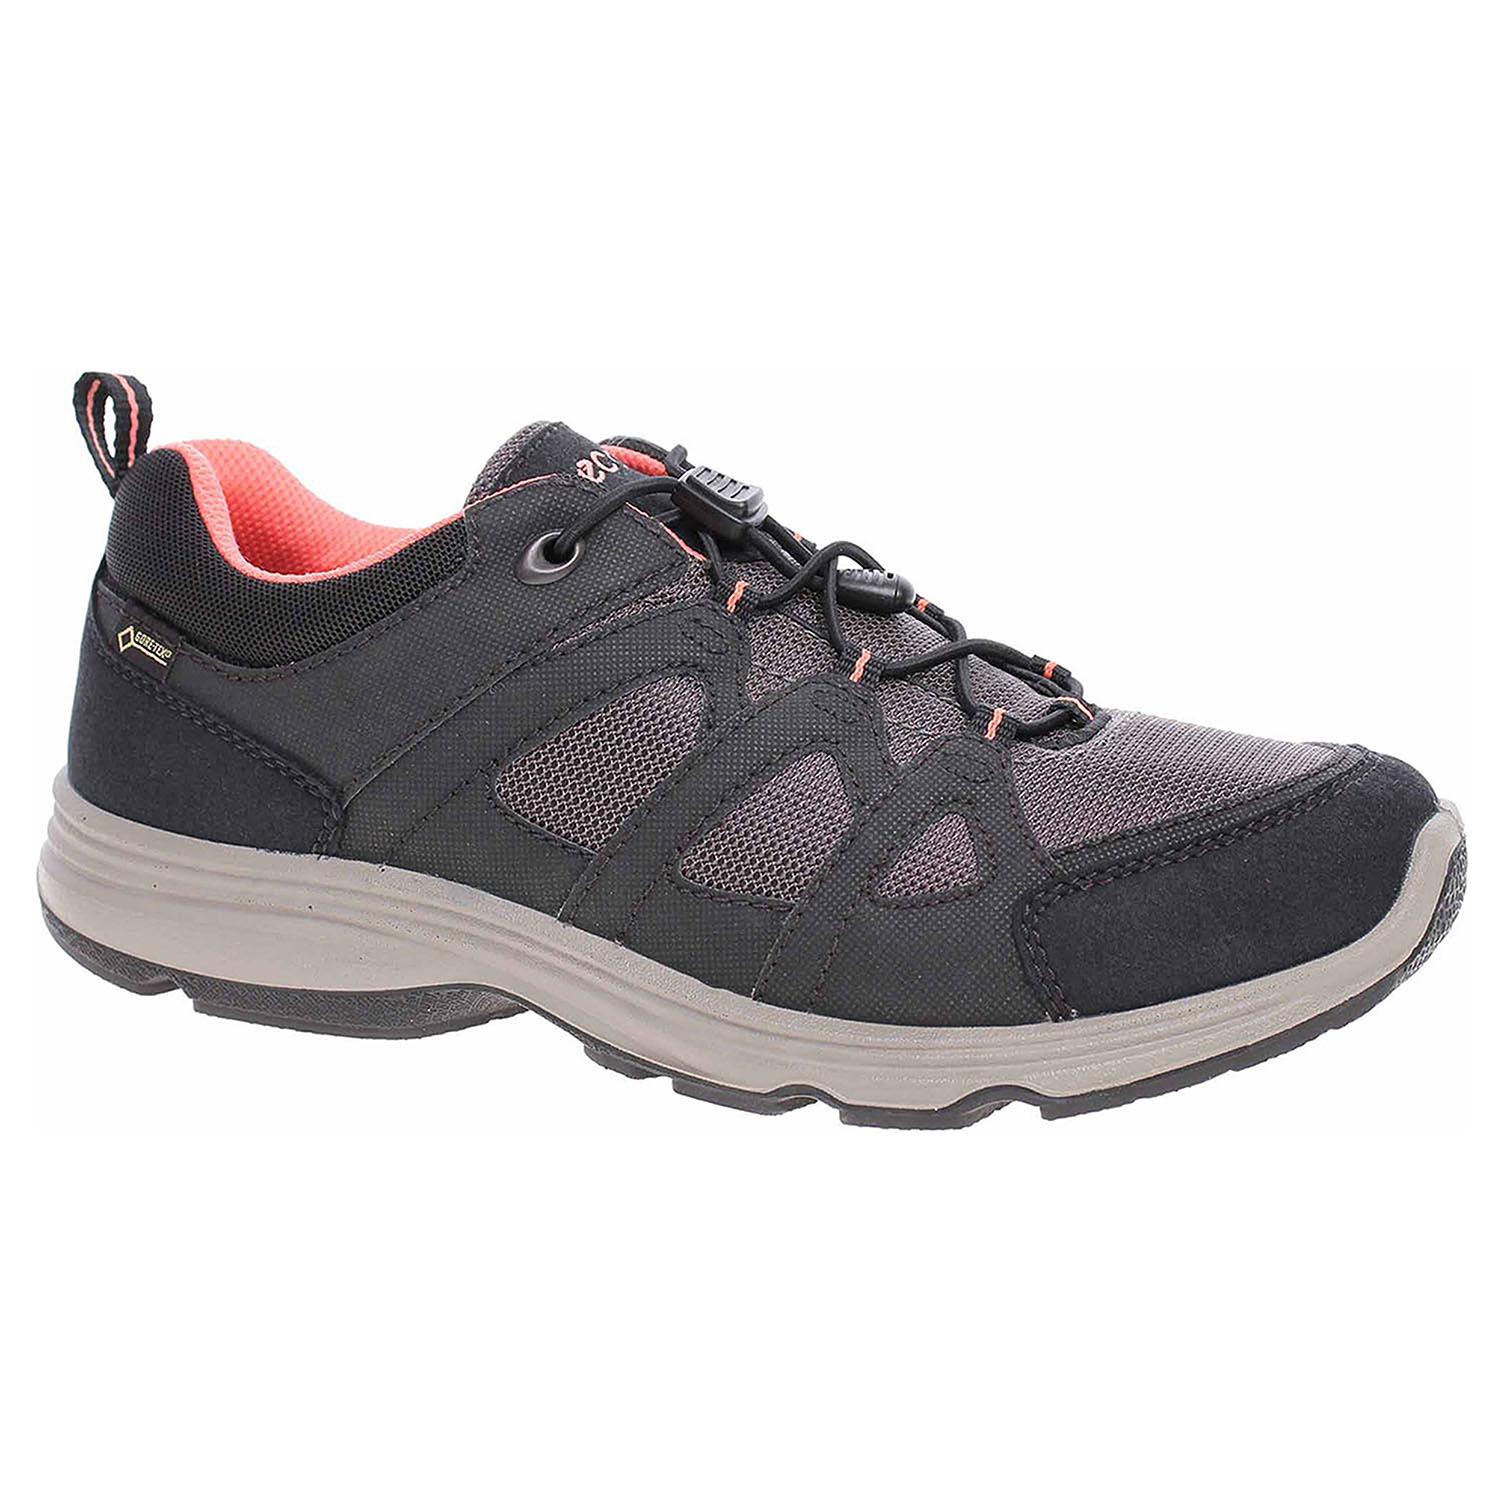 af11187fcec3f Dámska topánky Ecco Light IV 83602351527 černá | REJNOK obuv